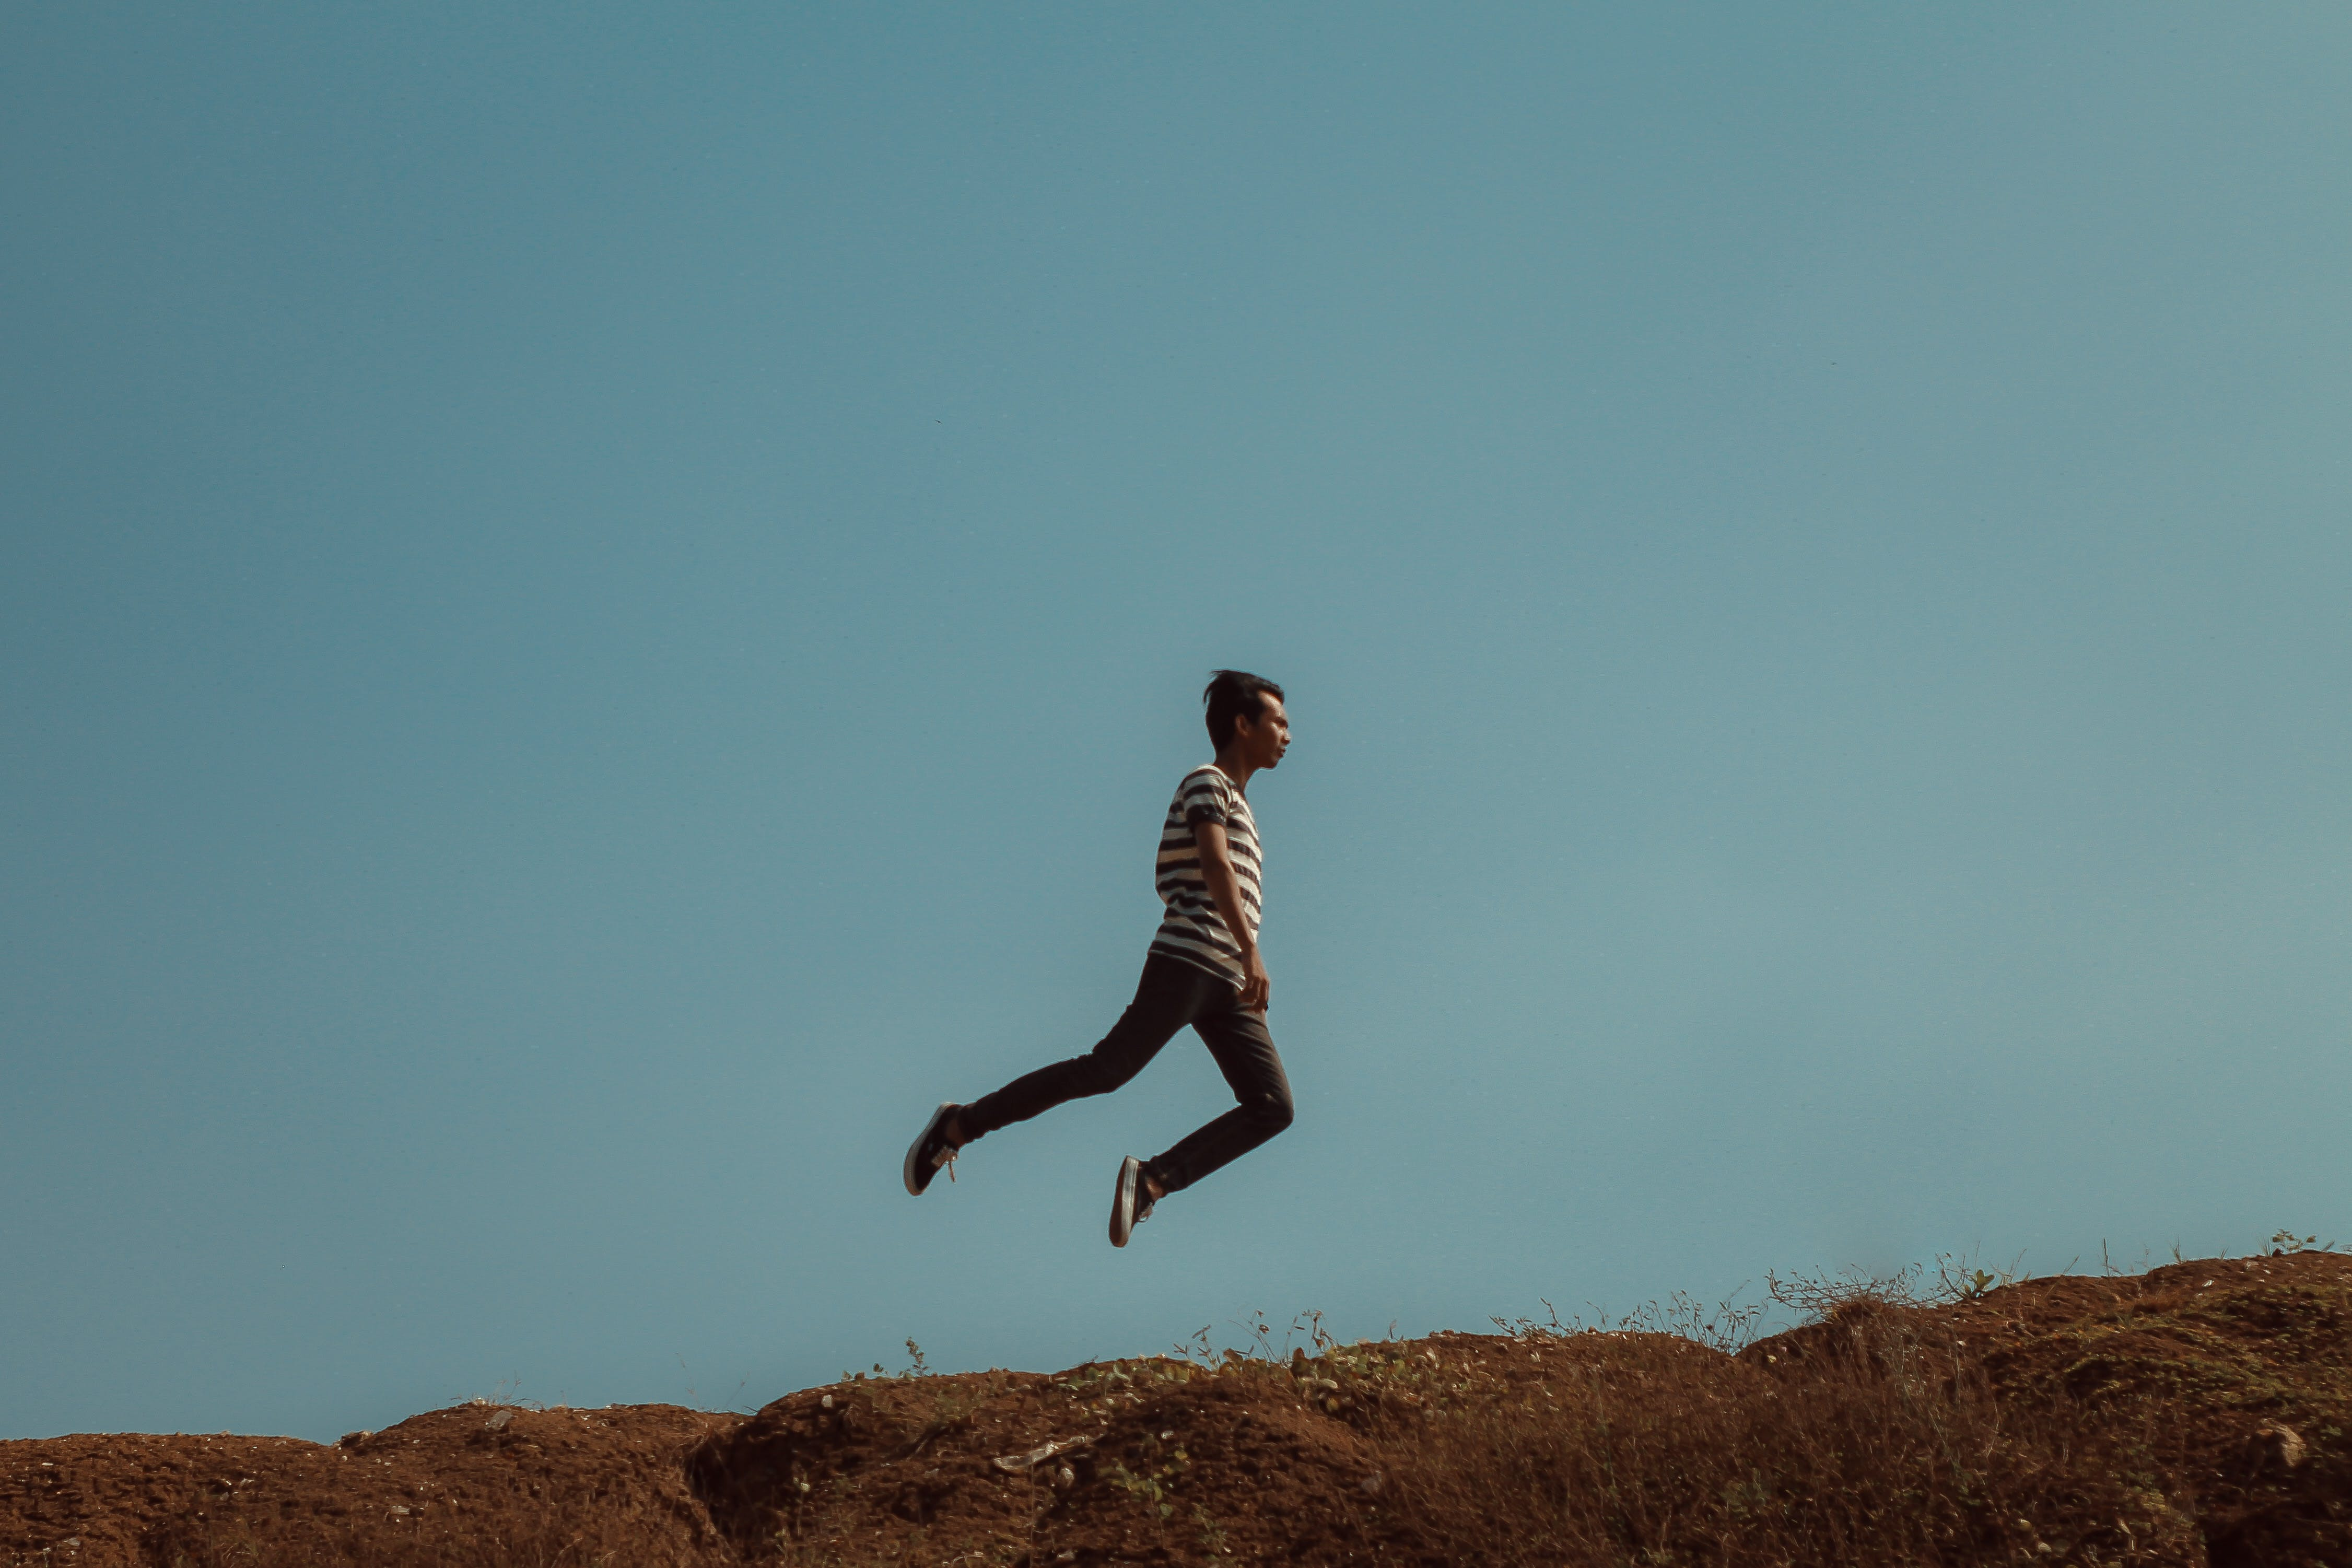 Man Jumping Near the Cliff